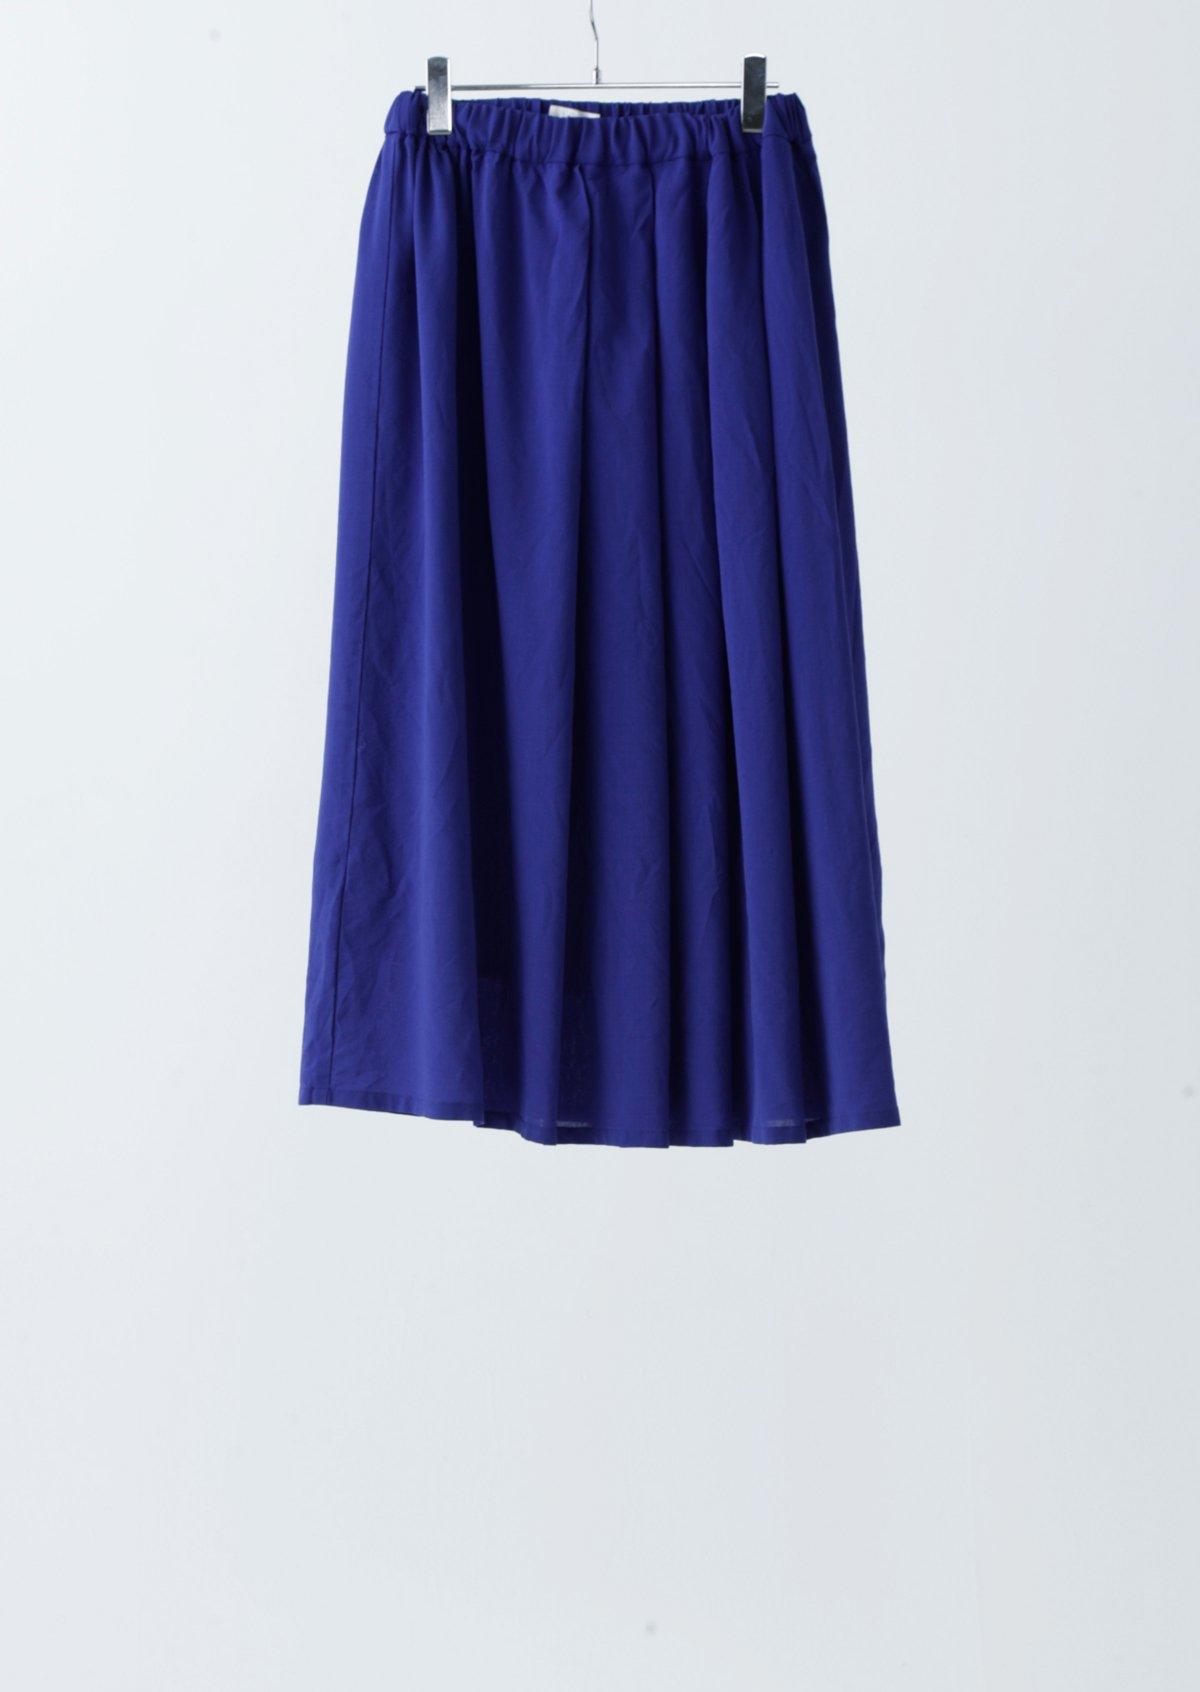 airスカート